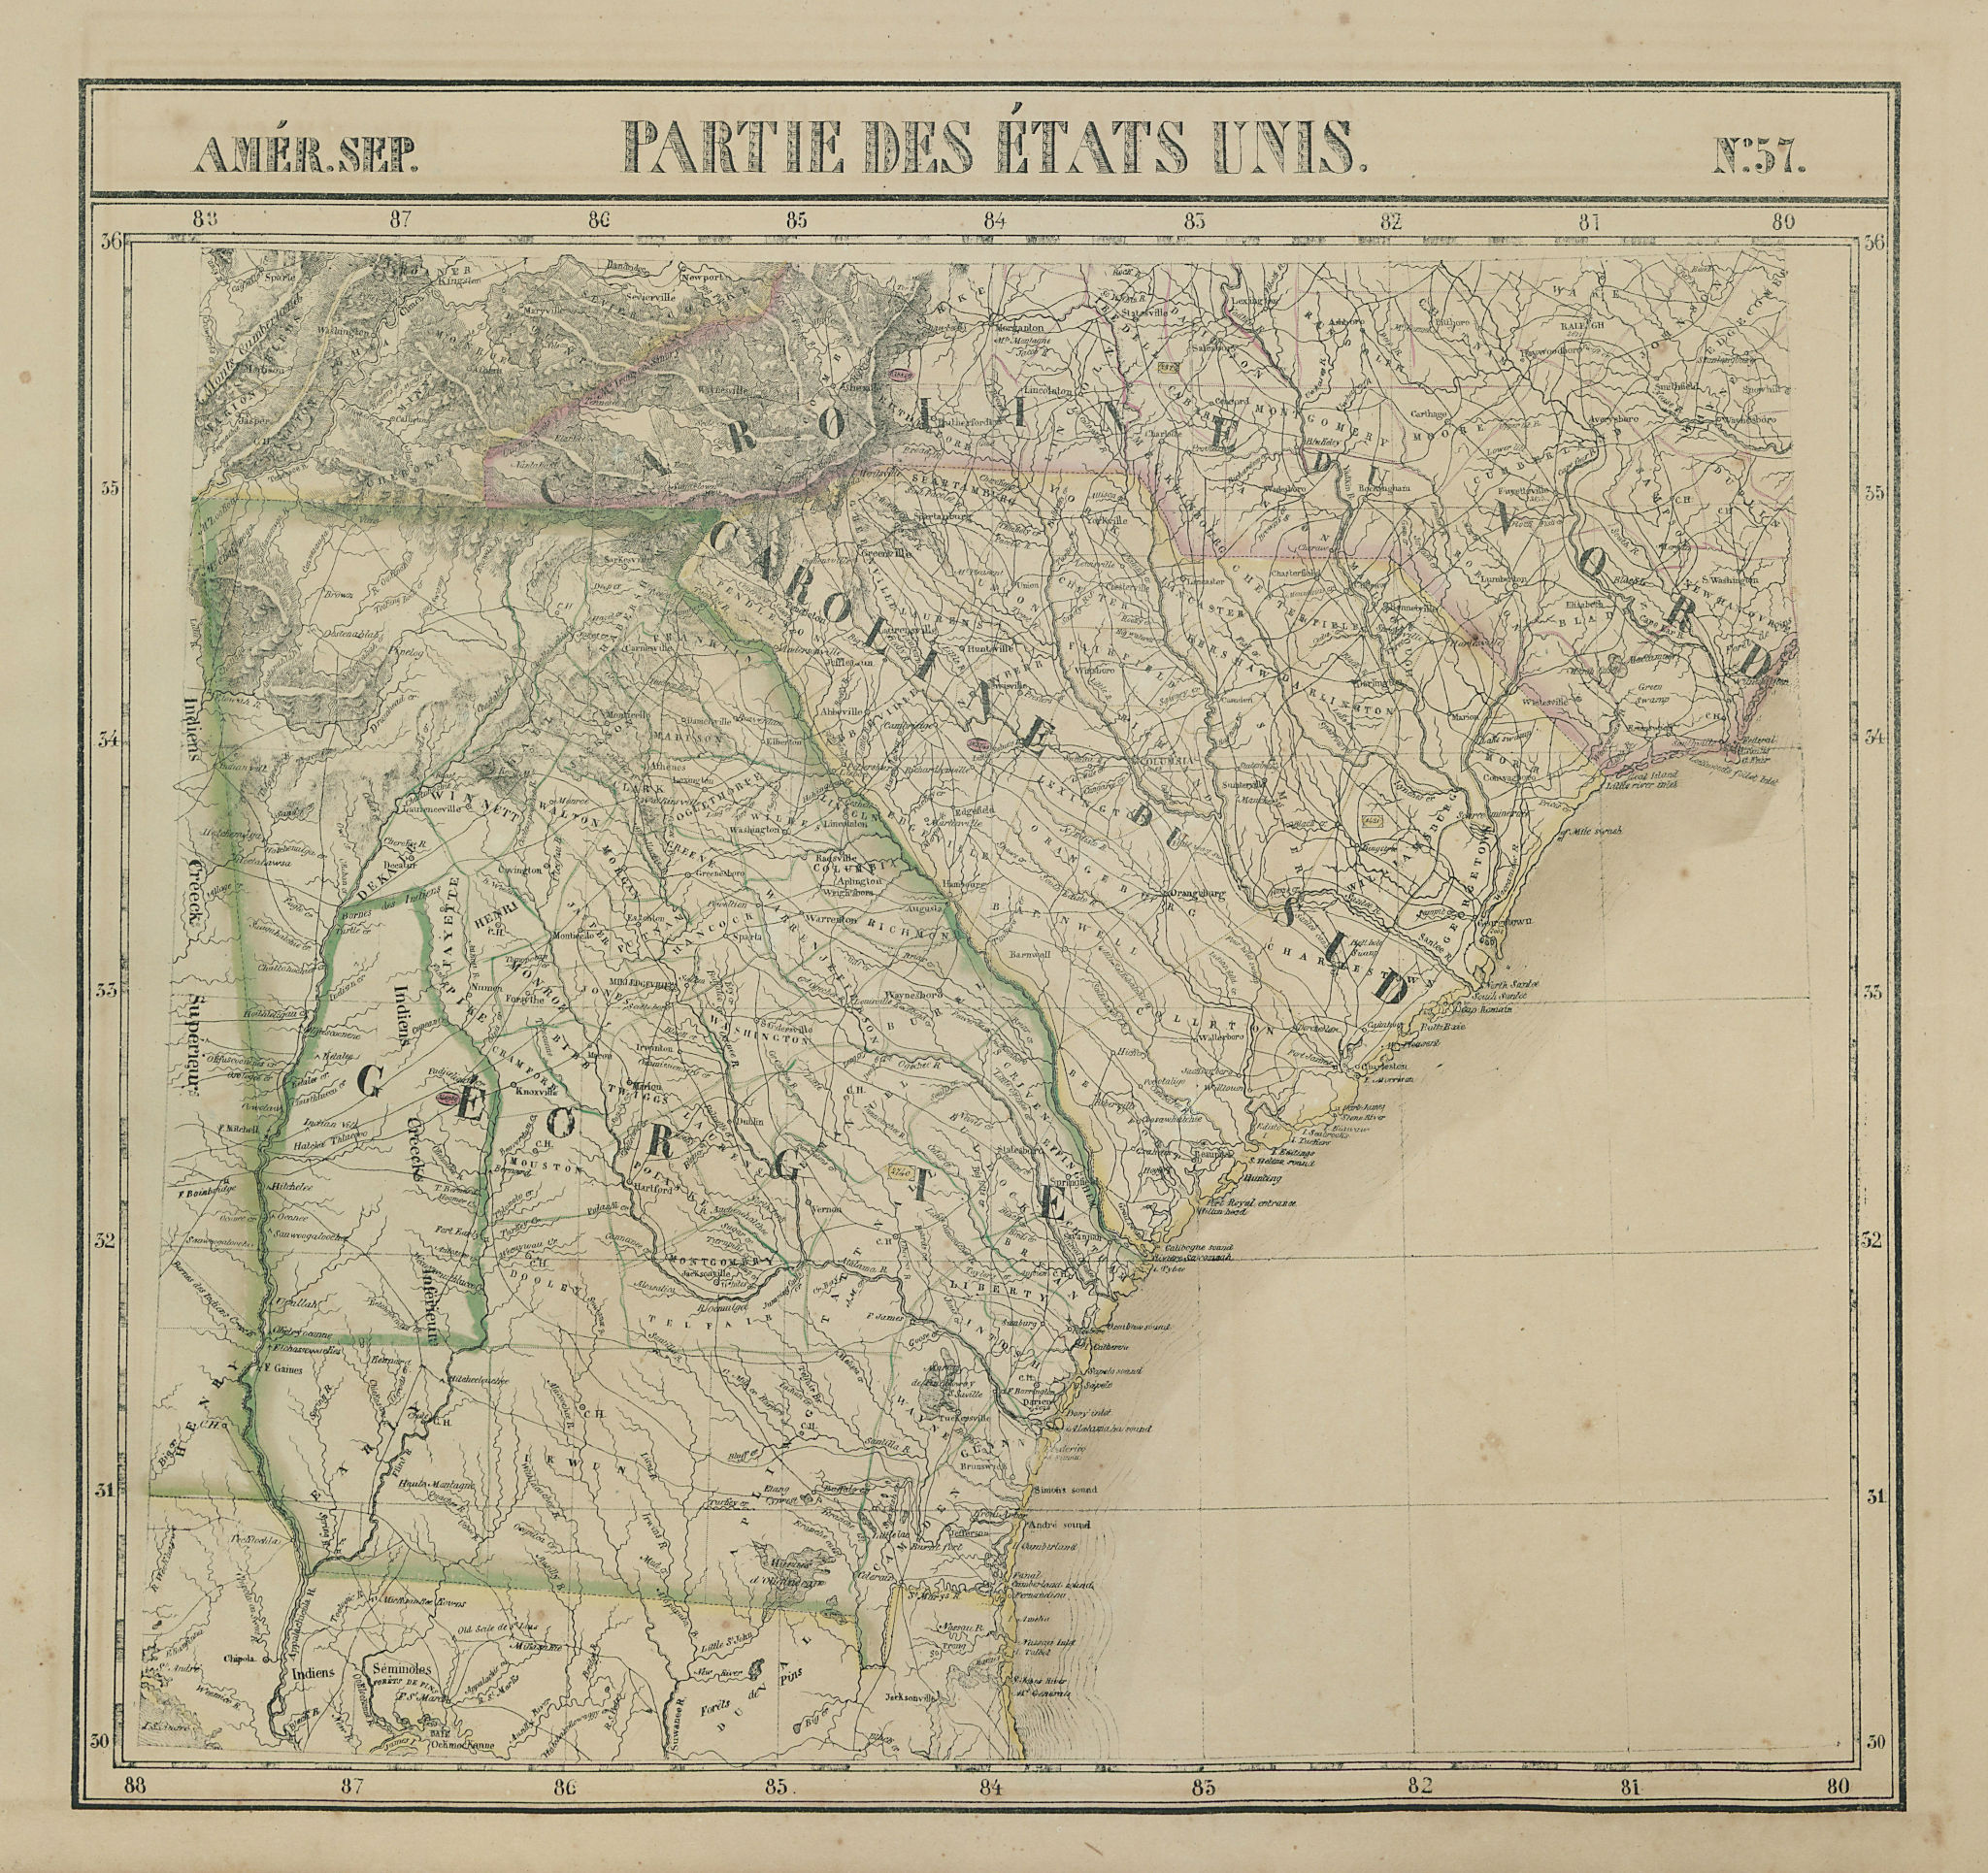 Amér Sep. Partie des États-Unis #57 Georgia South Carolina VANDERMAELEN 1827 map